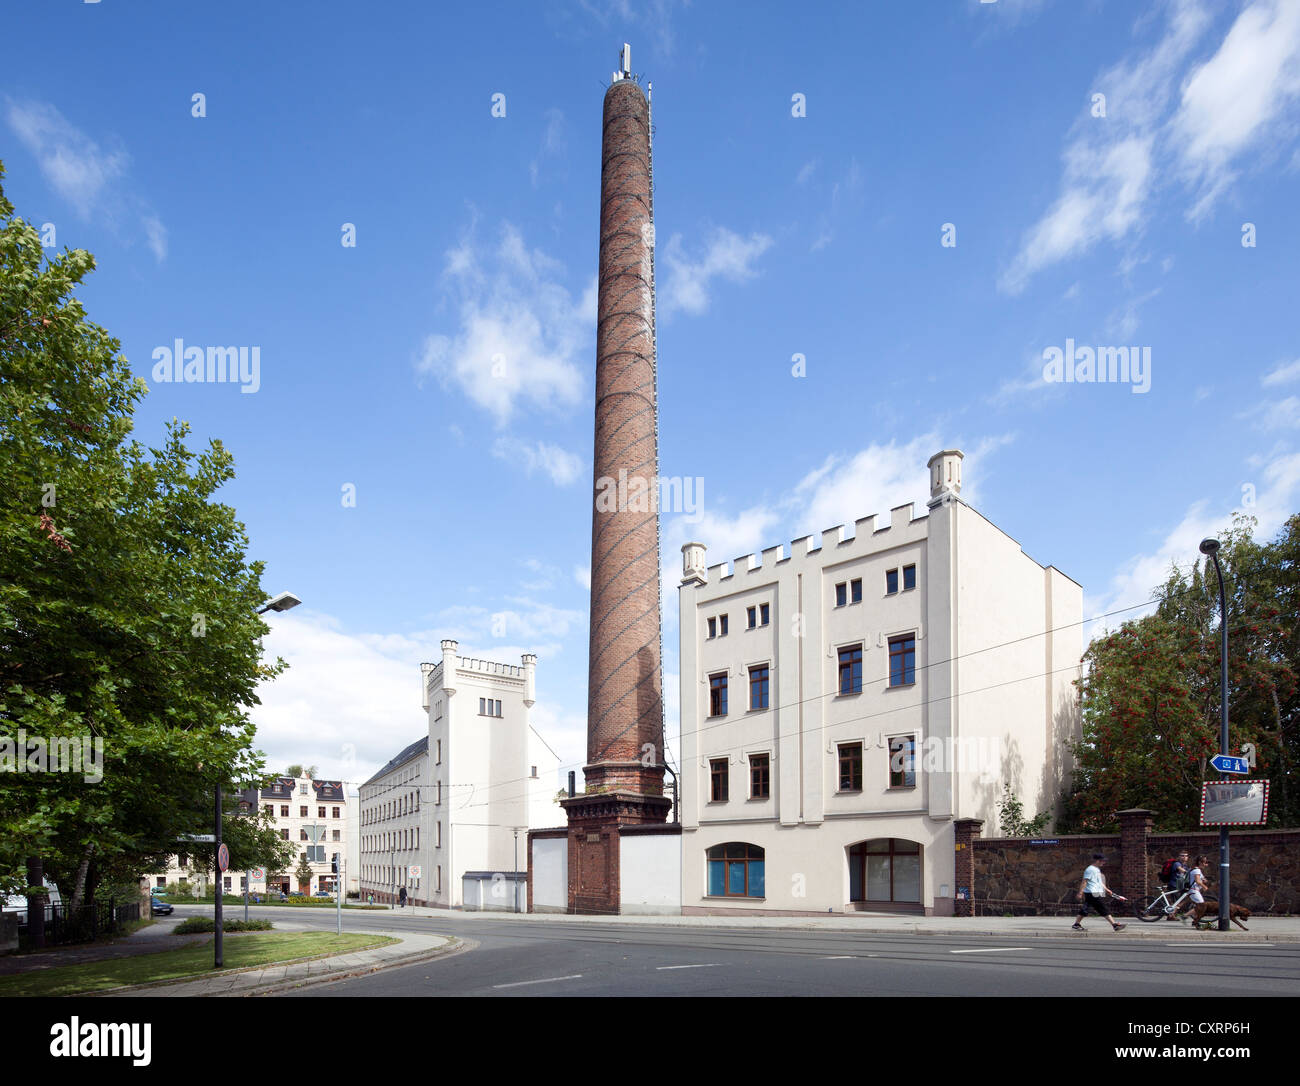 Agentur fuer Arbeit, Employment Agency, former factory, Goerlitz, Upper Lusatia, Lusatia, Saxony, Germany, Europe, - Stock Image